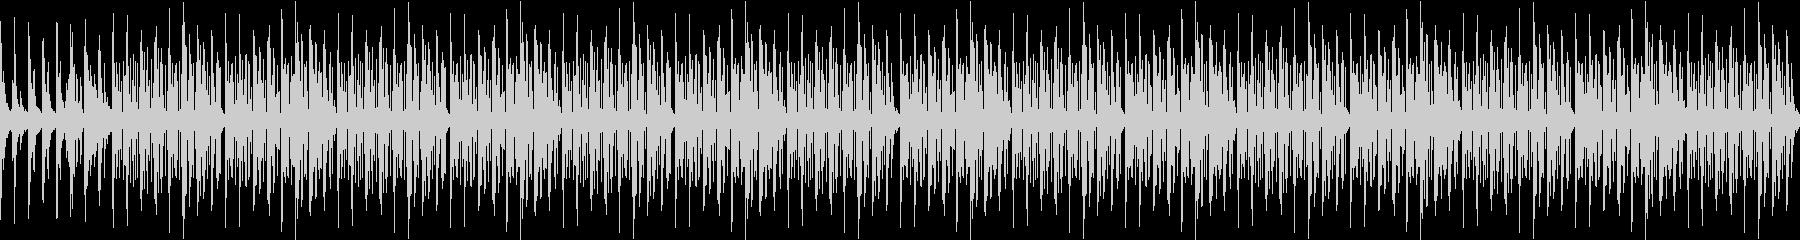 【BGM】リラックス・ジャズ・カフェの未再生の波形